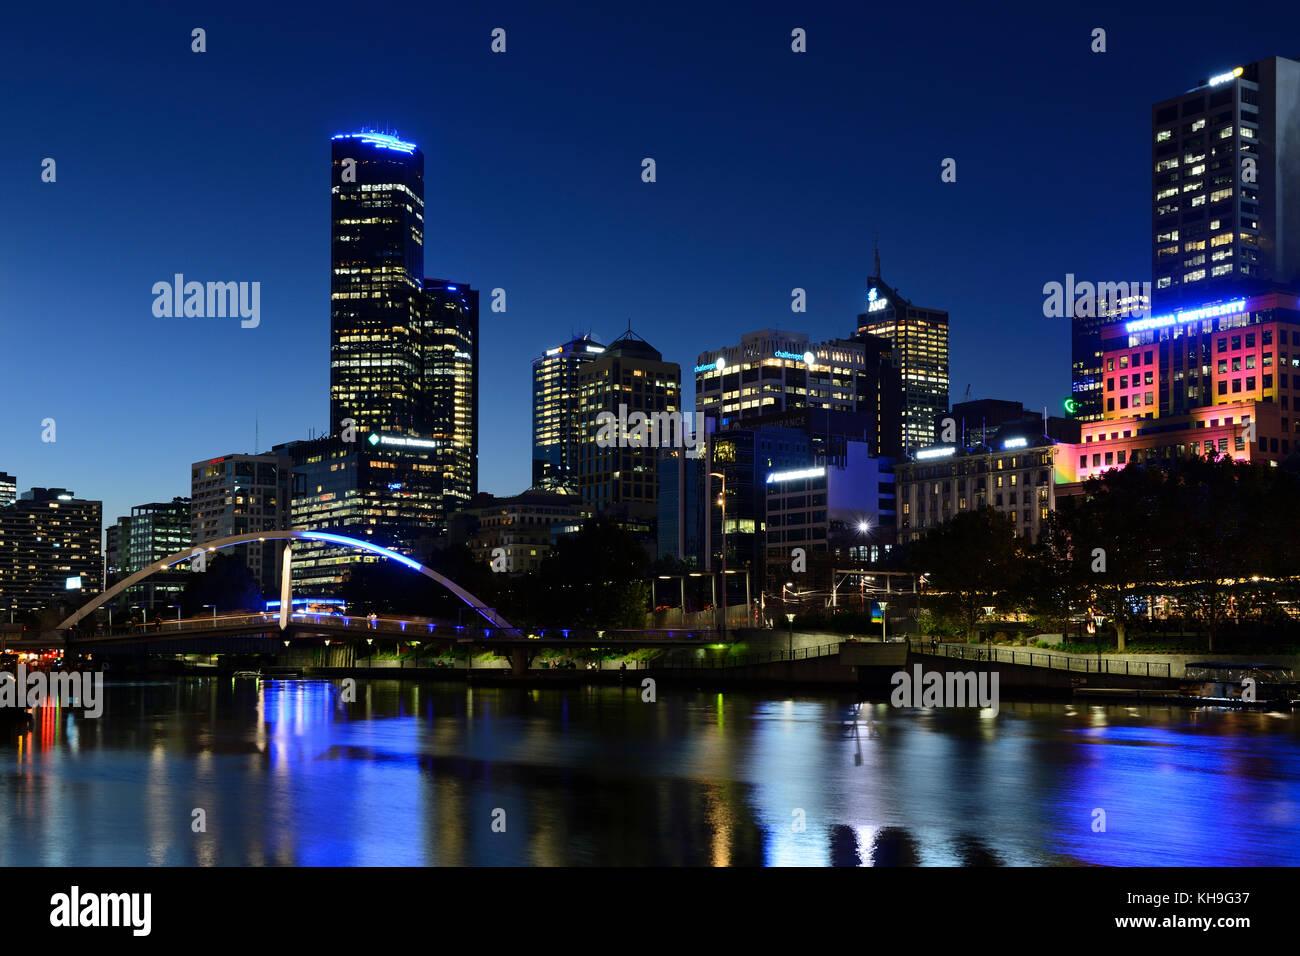 Northbank city skyline and Evan Walker Bridge on Yarra River by night - Melbourne, Victoria, Australia - Stock Image